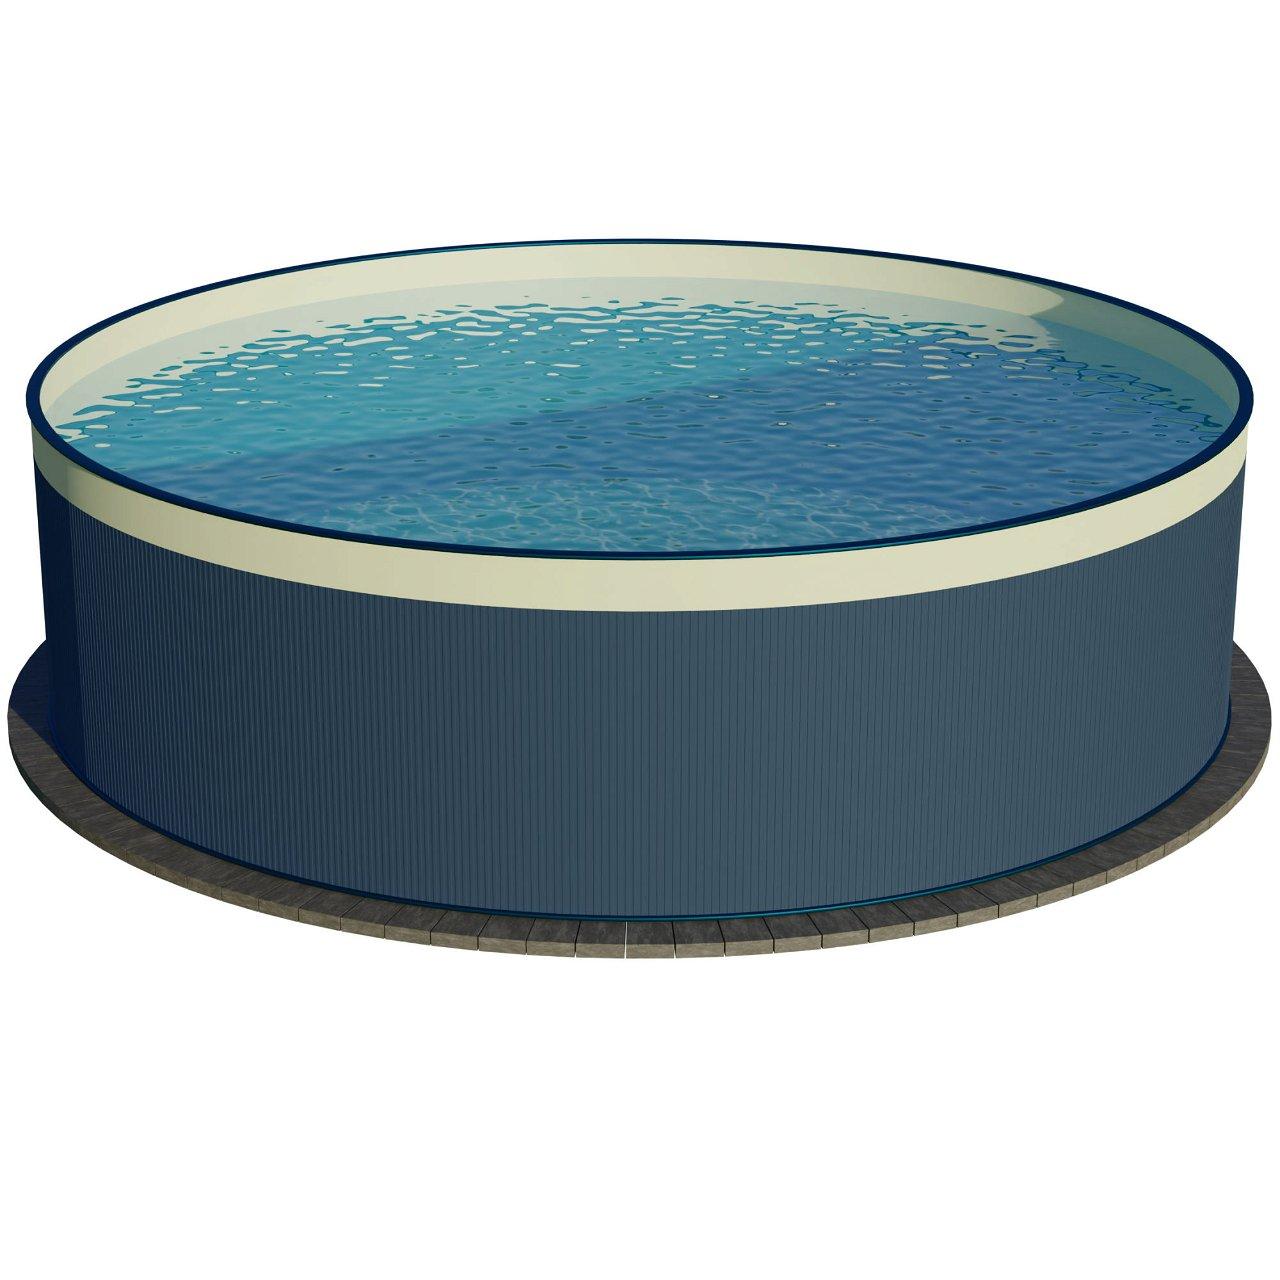 Stahlwandpool rundform anthrazit 450x90 cm, overlap S2